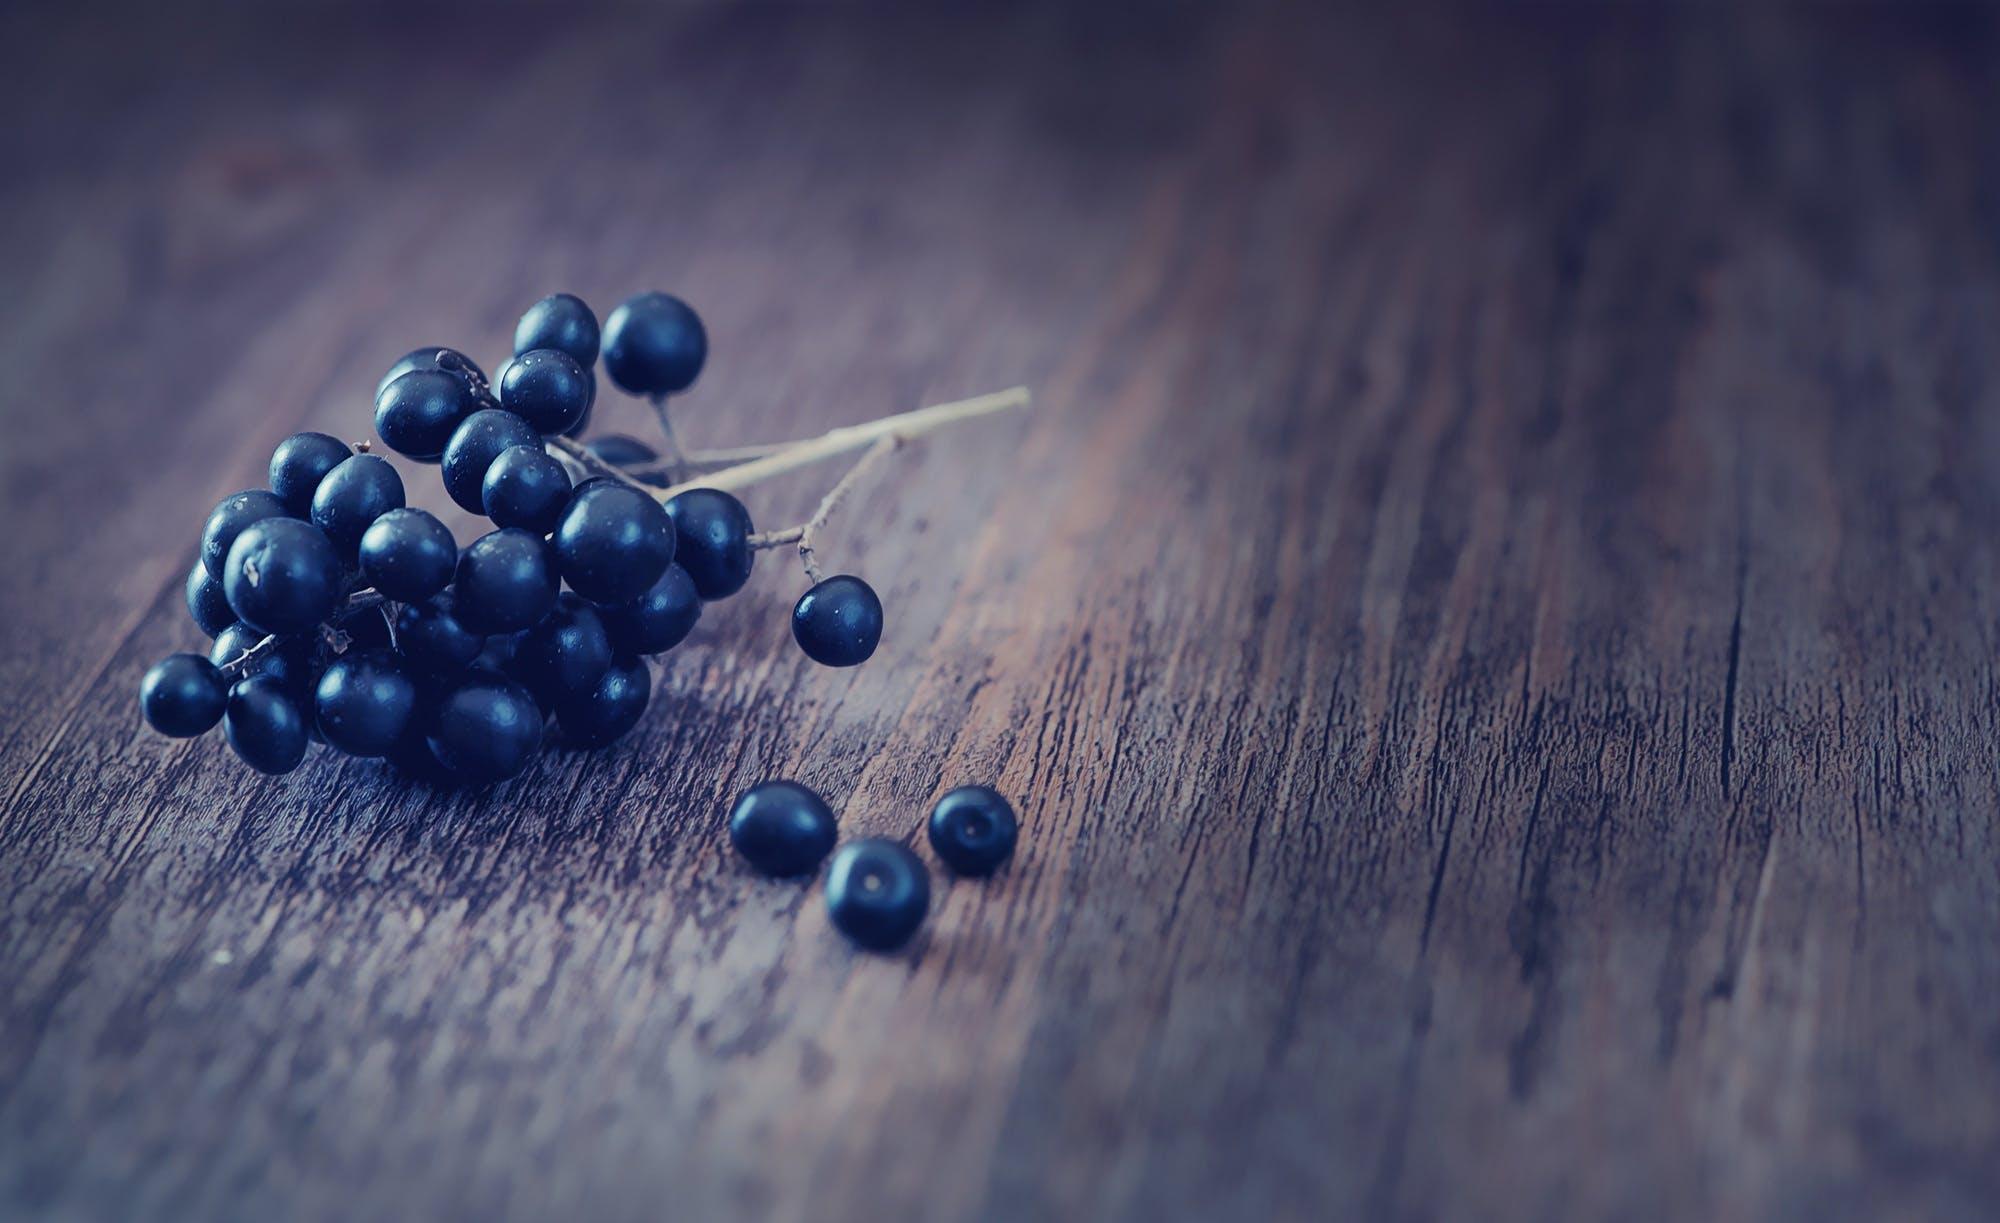 berries, blur, close-up